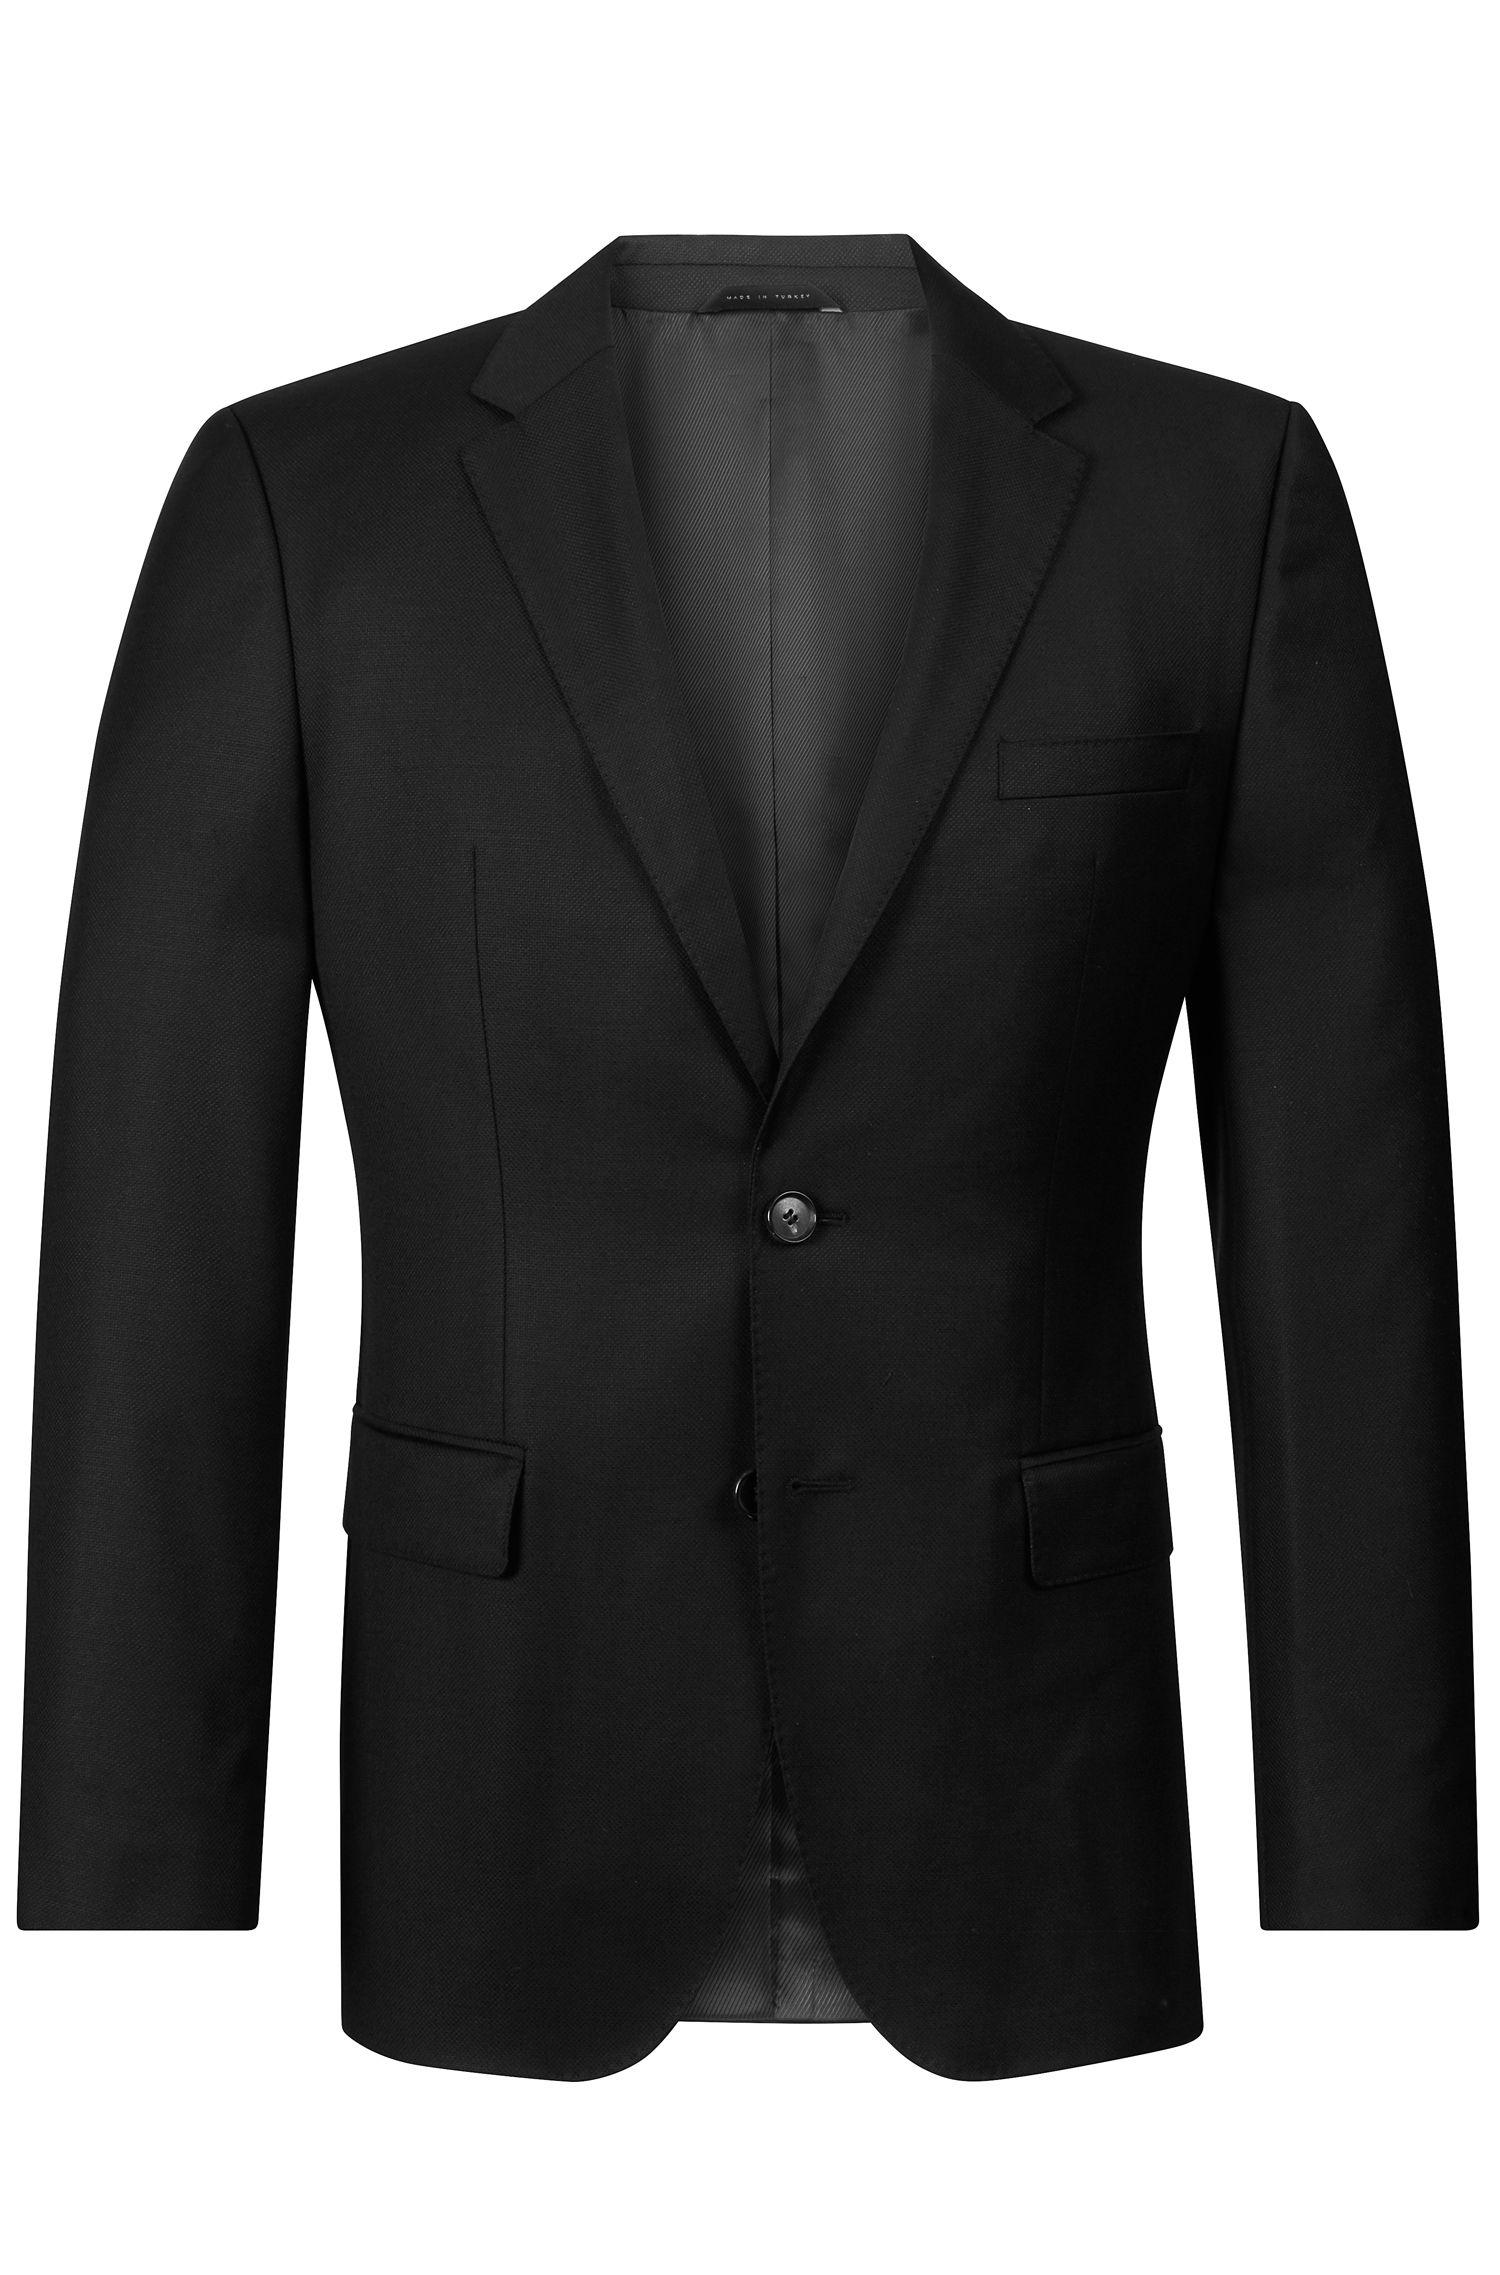 'The James' | Regular Fit, Virgin Wool Sport Coat